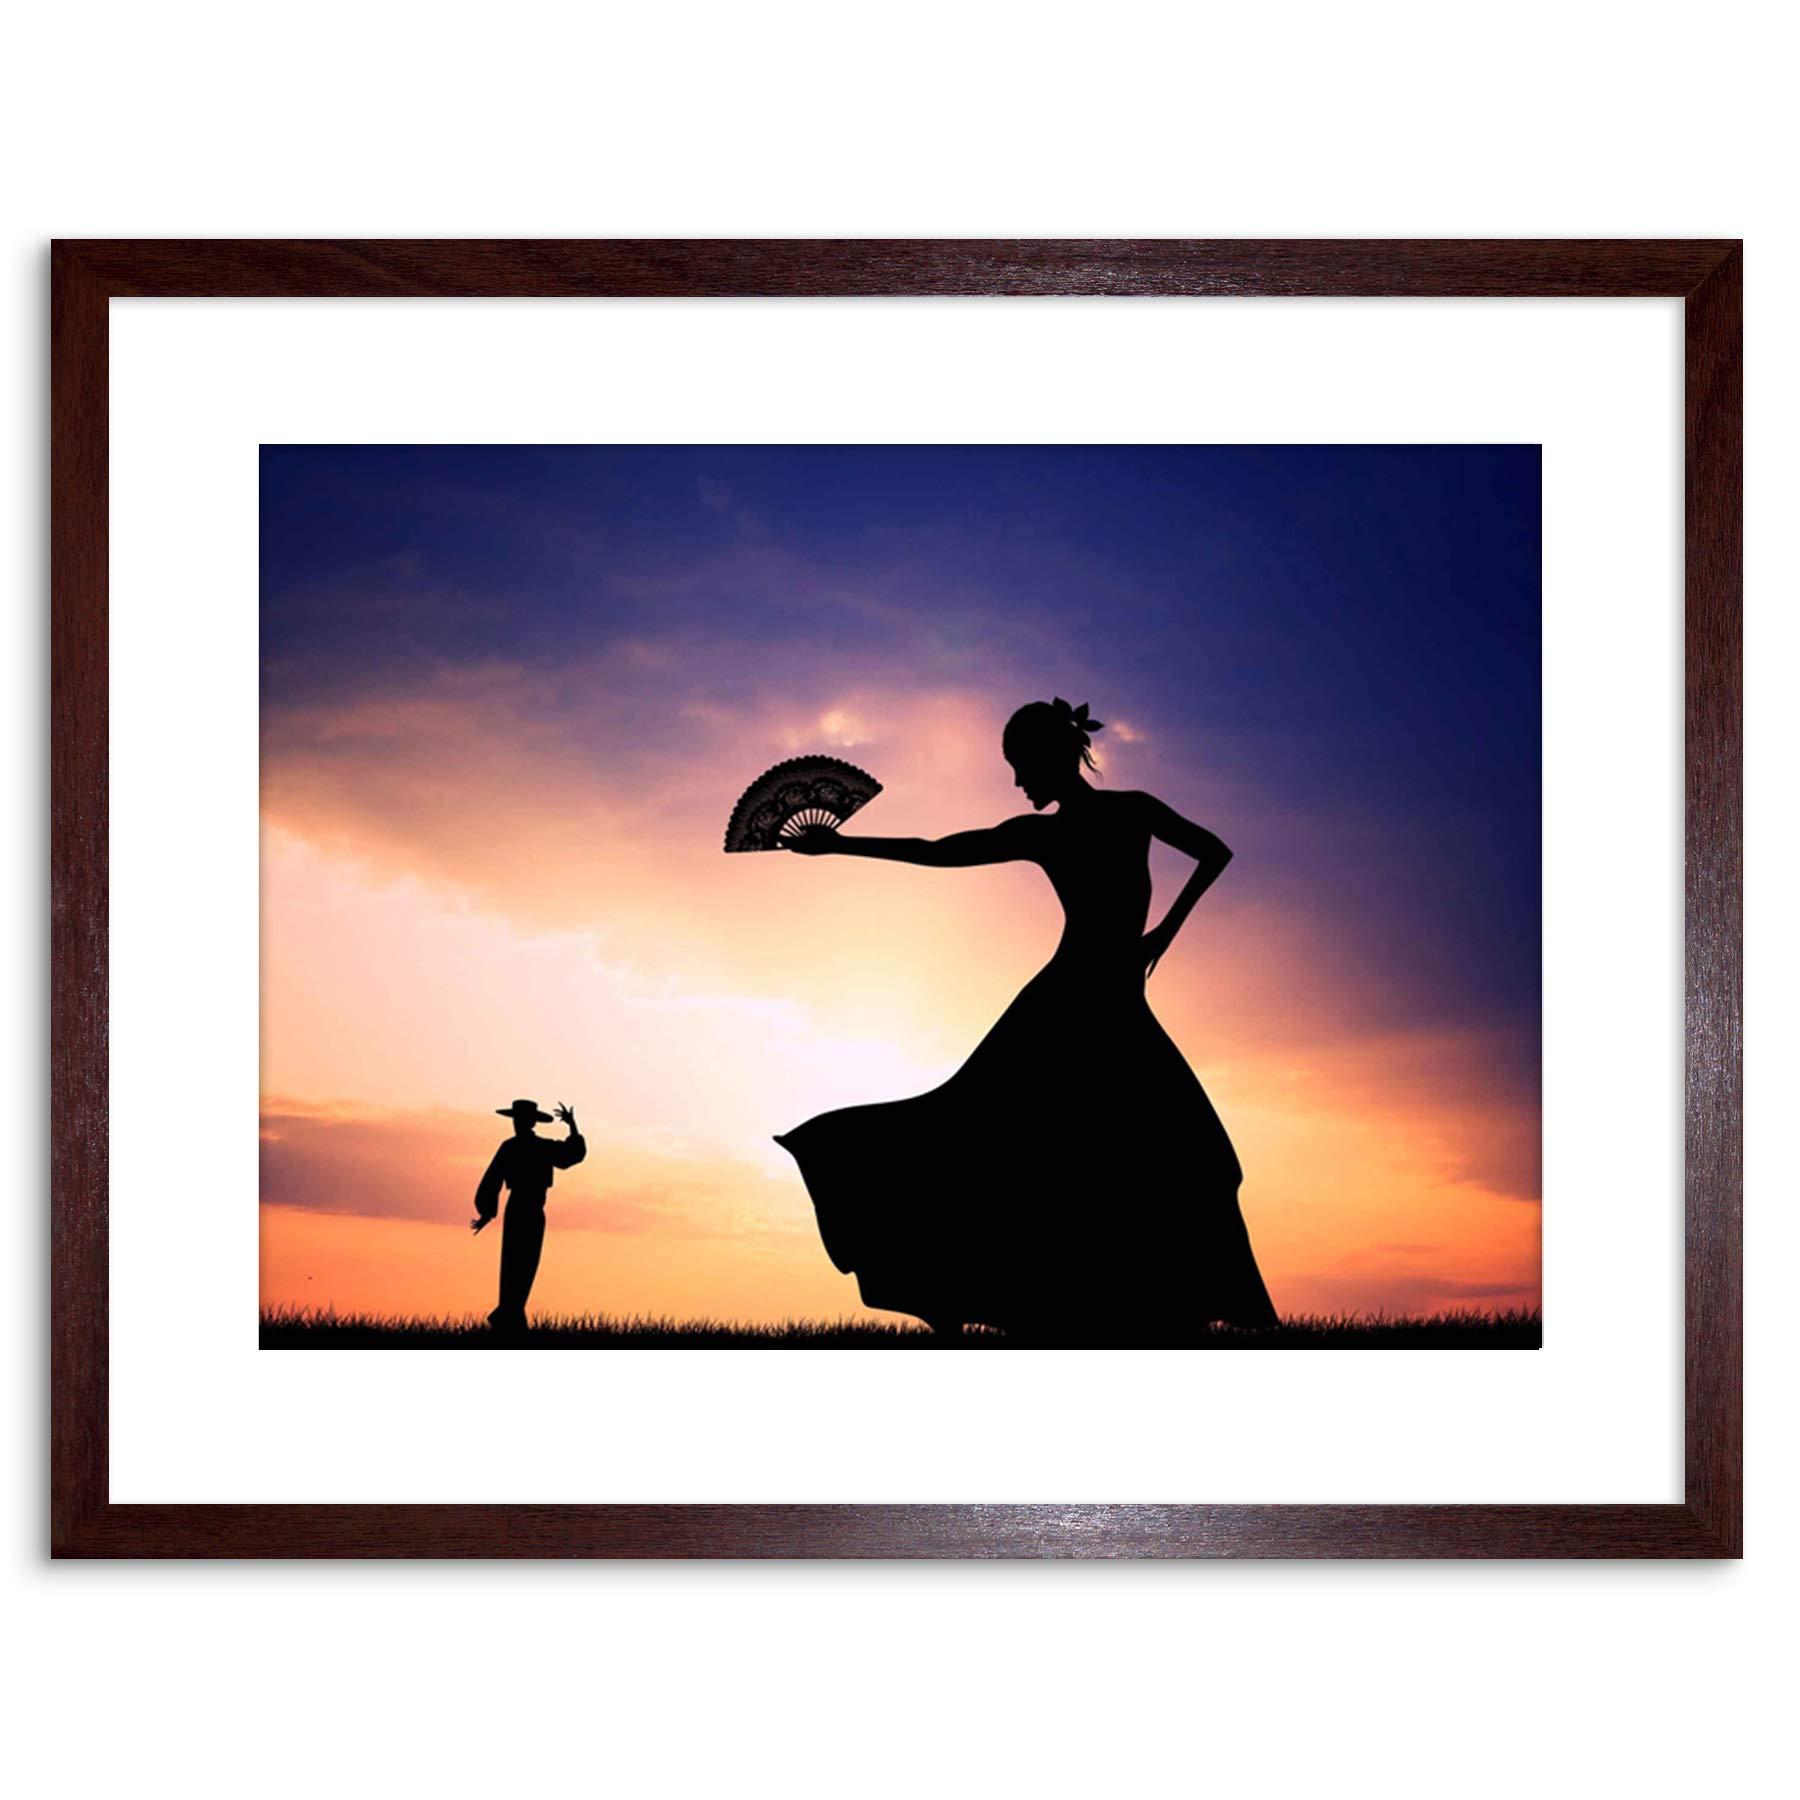 Amazon Com The Art Stop Photo Mock Up Silhouette Sunset Flamenco Dancing Framed Print F97x5339 Furniture Decor